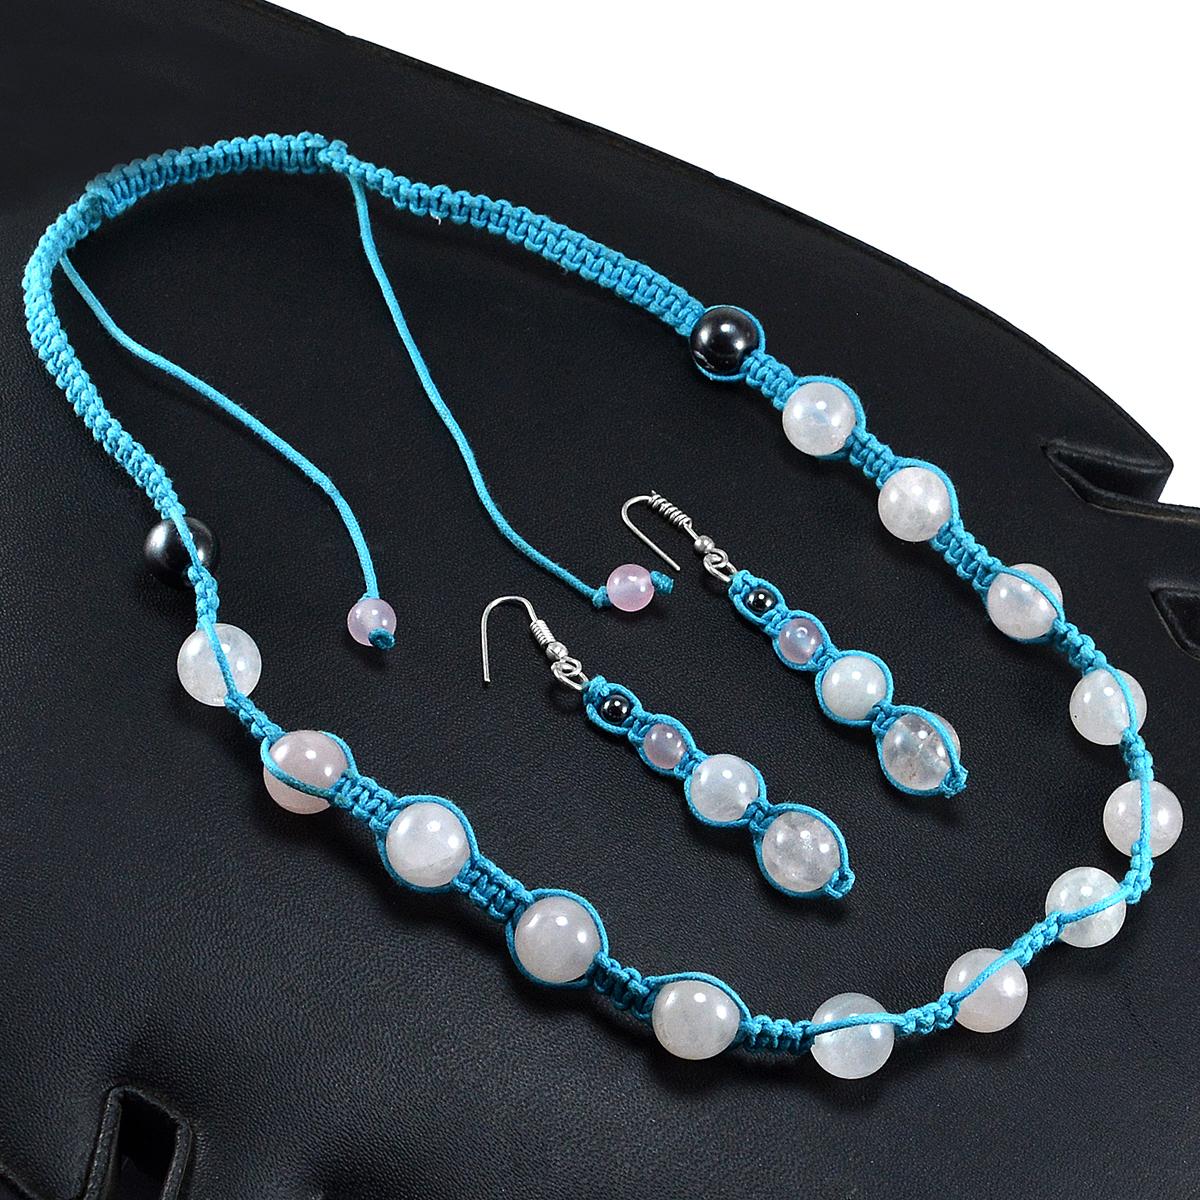 Handmade Jewelry Manufacturer Rose Quartz & Hematite 925 Silver Adjustable Jaipur Rajasthan India Necklace & Earring Set